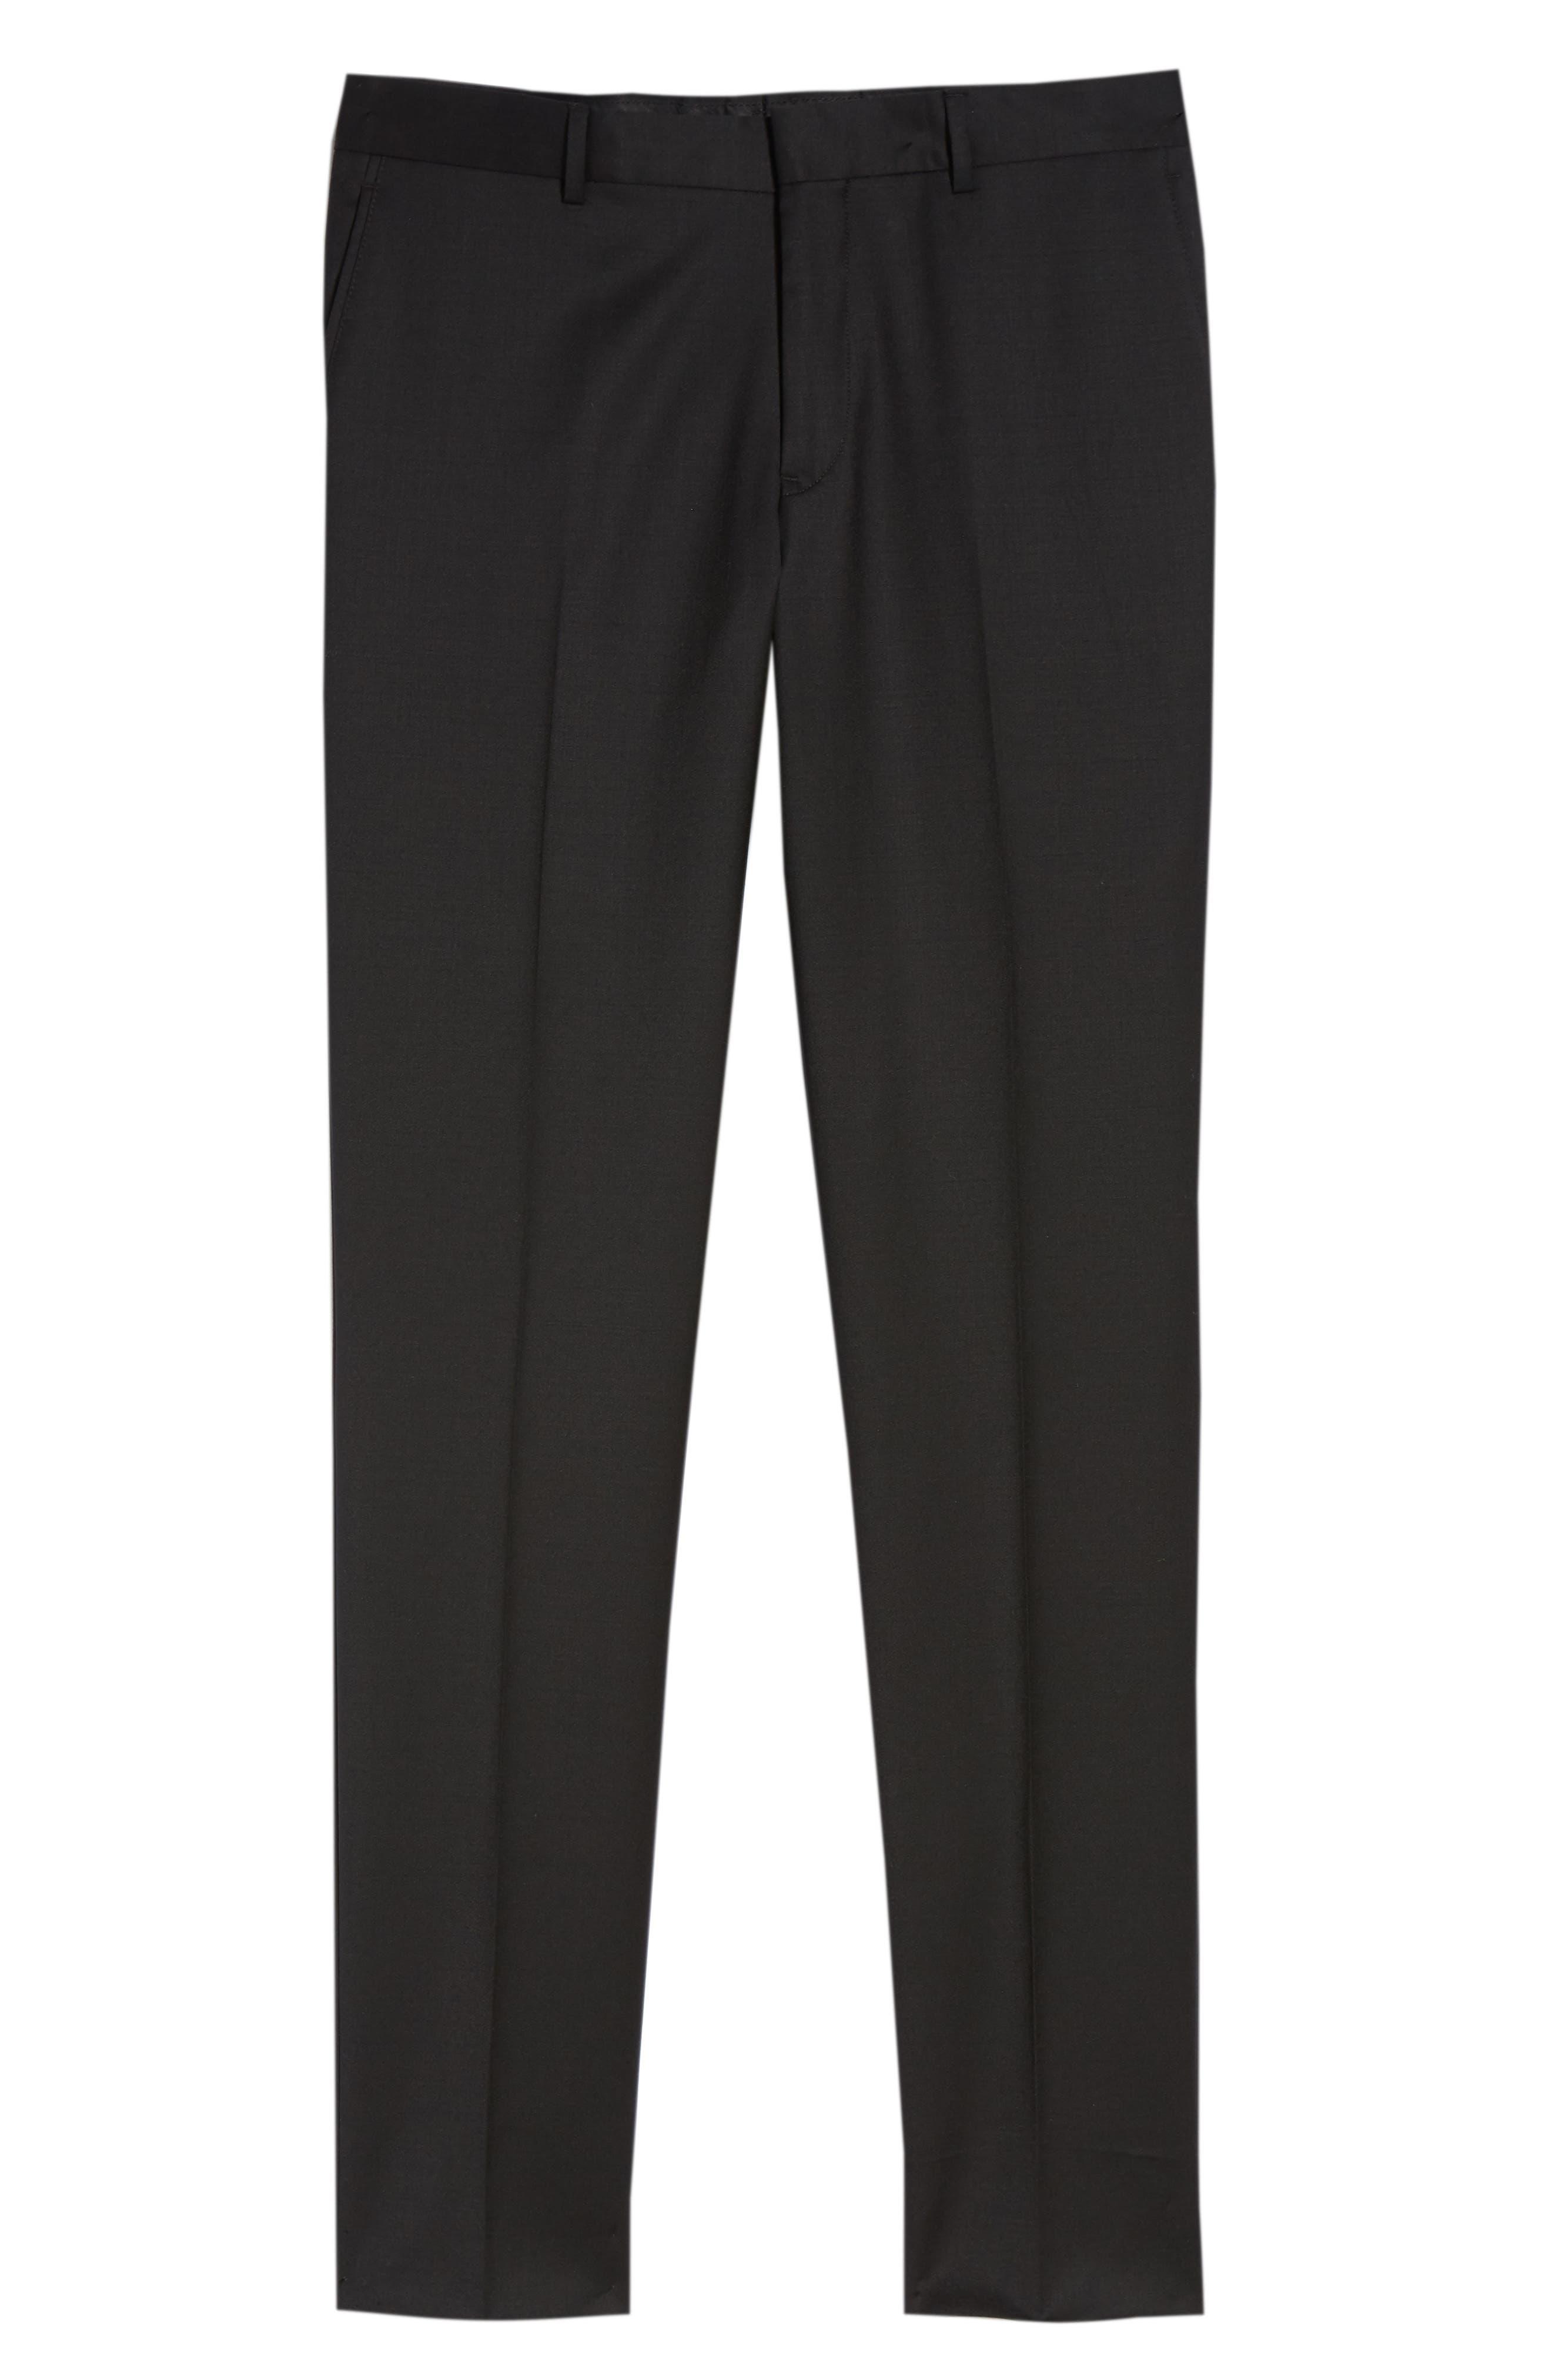 Flat Front Tech-Smart Extra Trim Trousers,                             Alternate thumbnail 6, color,                             001